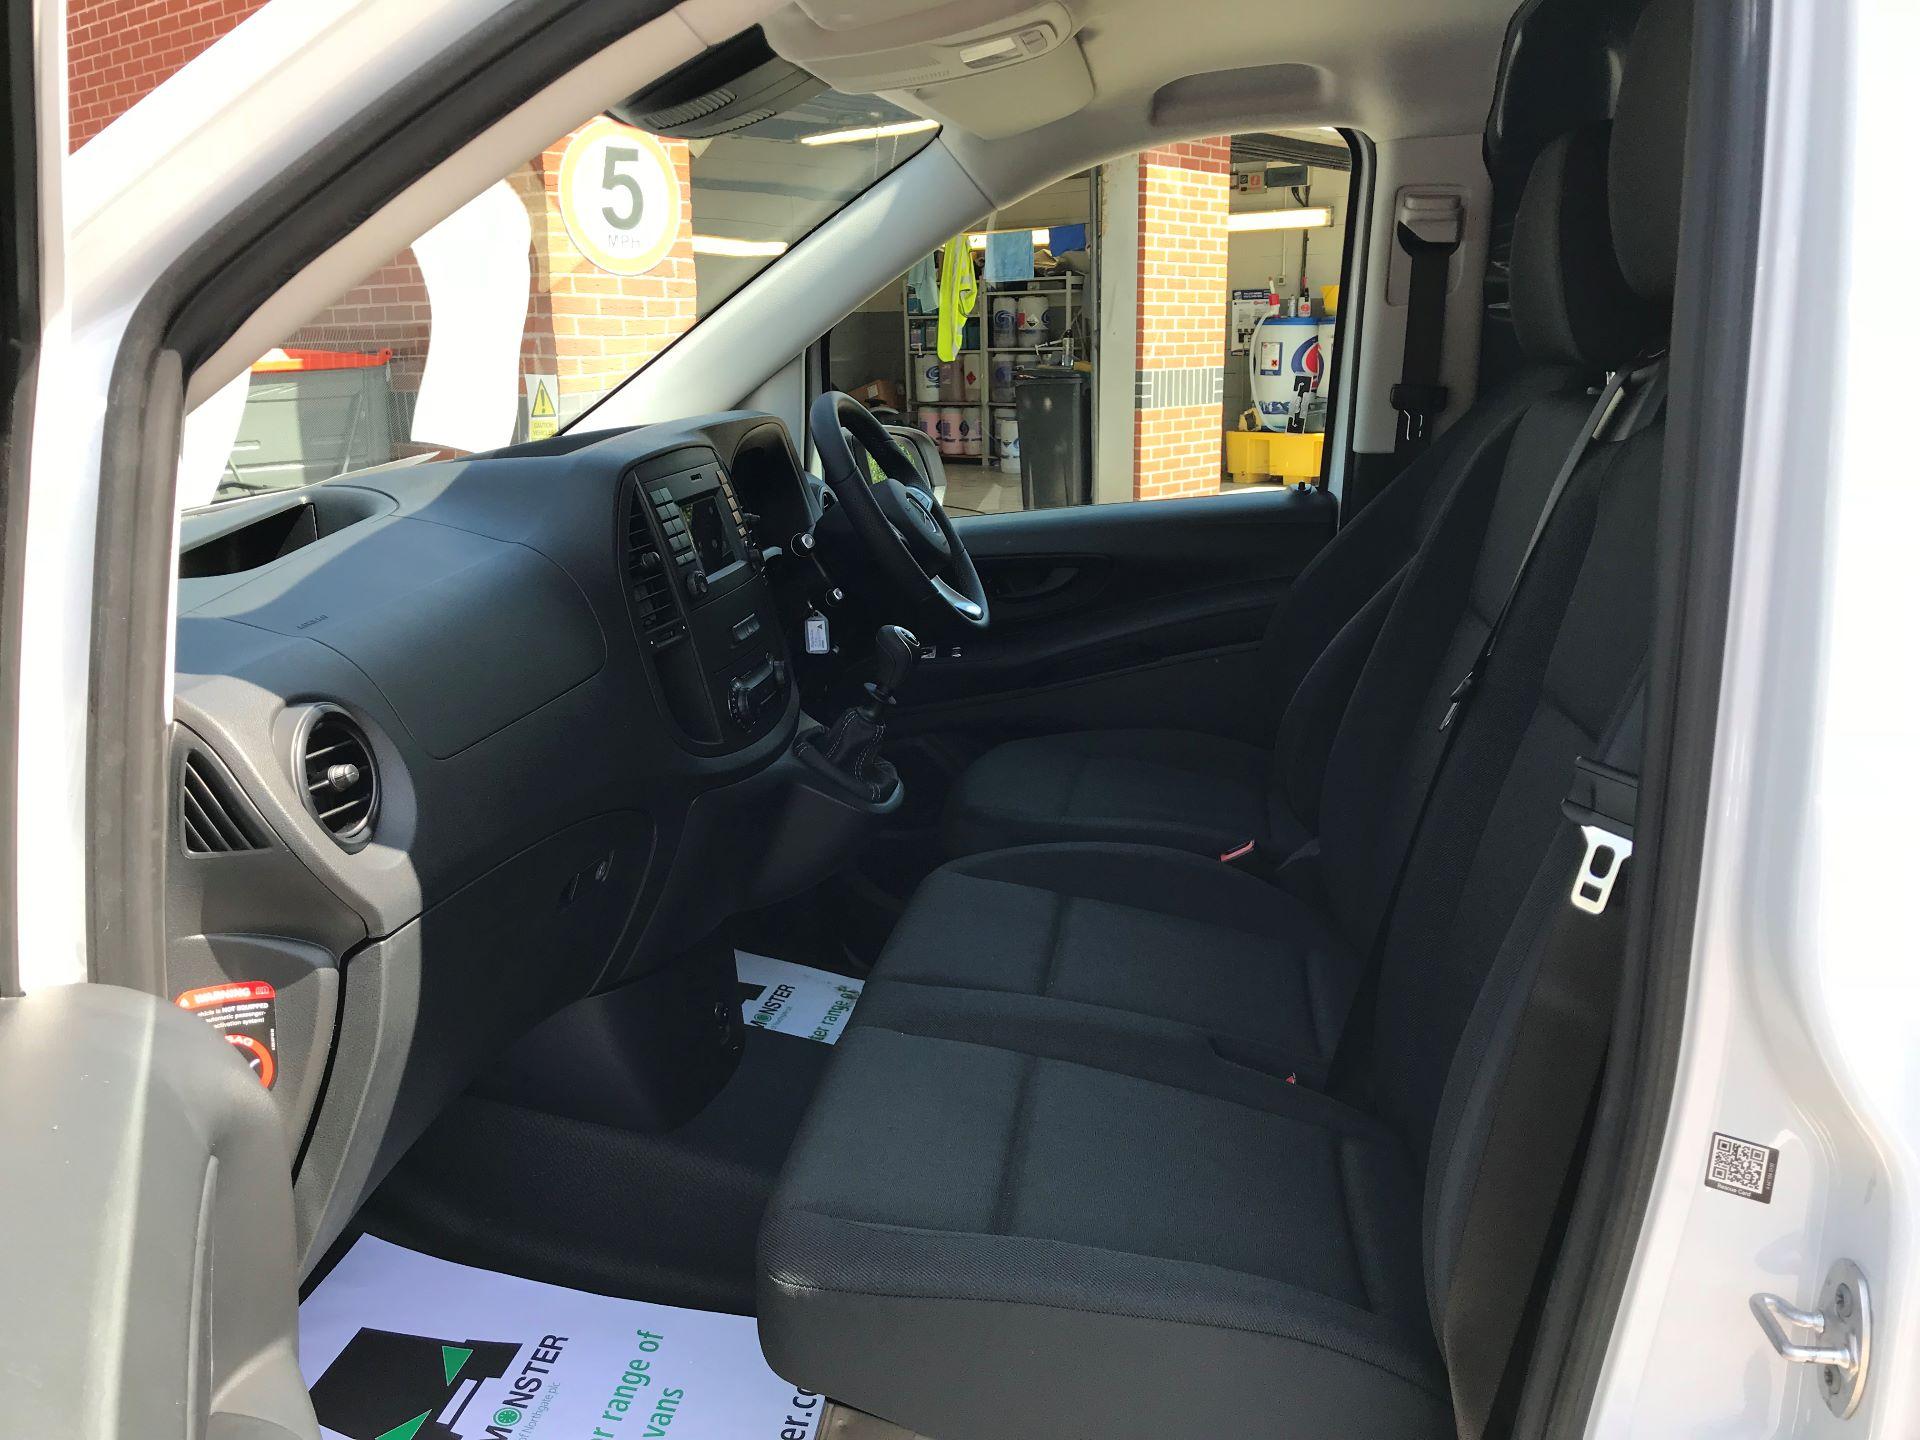 2019 Mercedes-Benz Vito 111CDI LWB 110PS EURO 6, AIR CON (YN19ZGH) Image 16